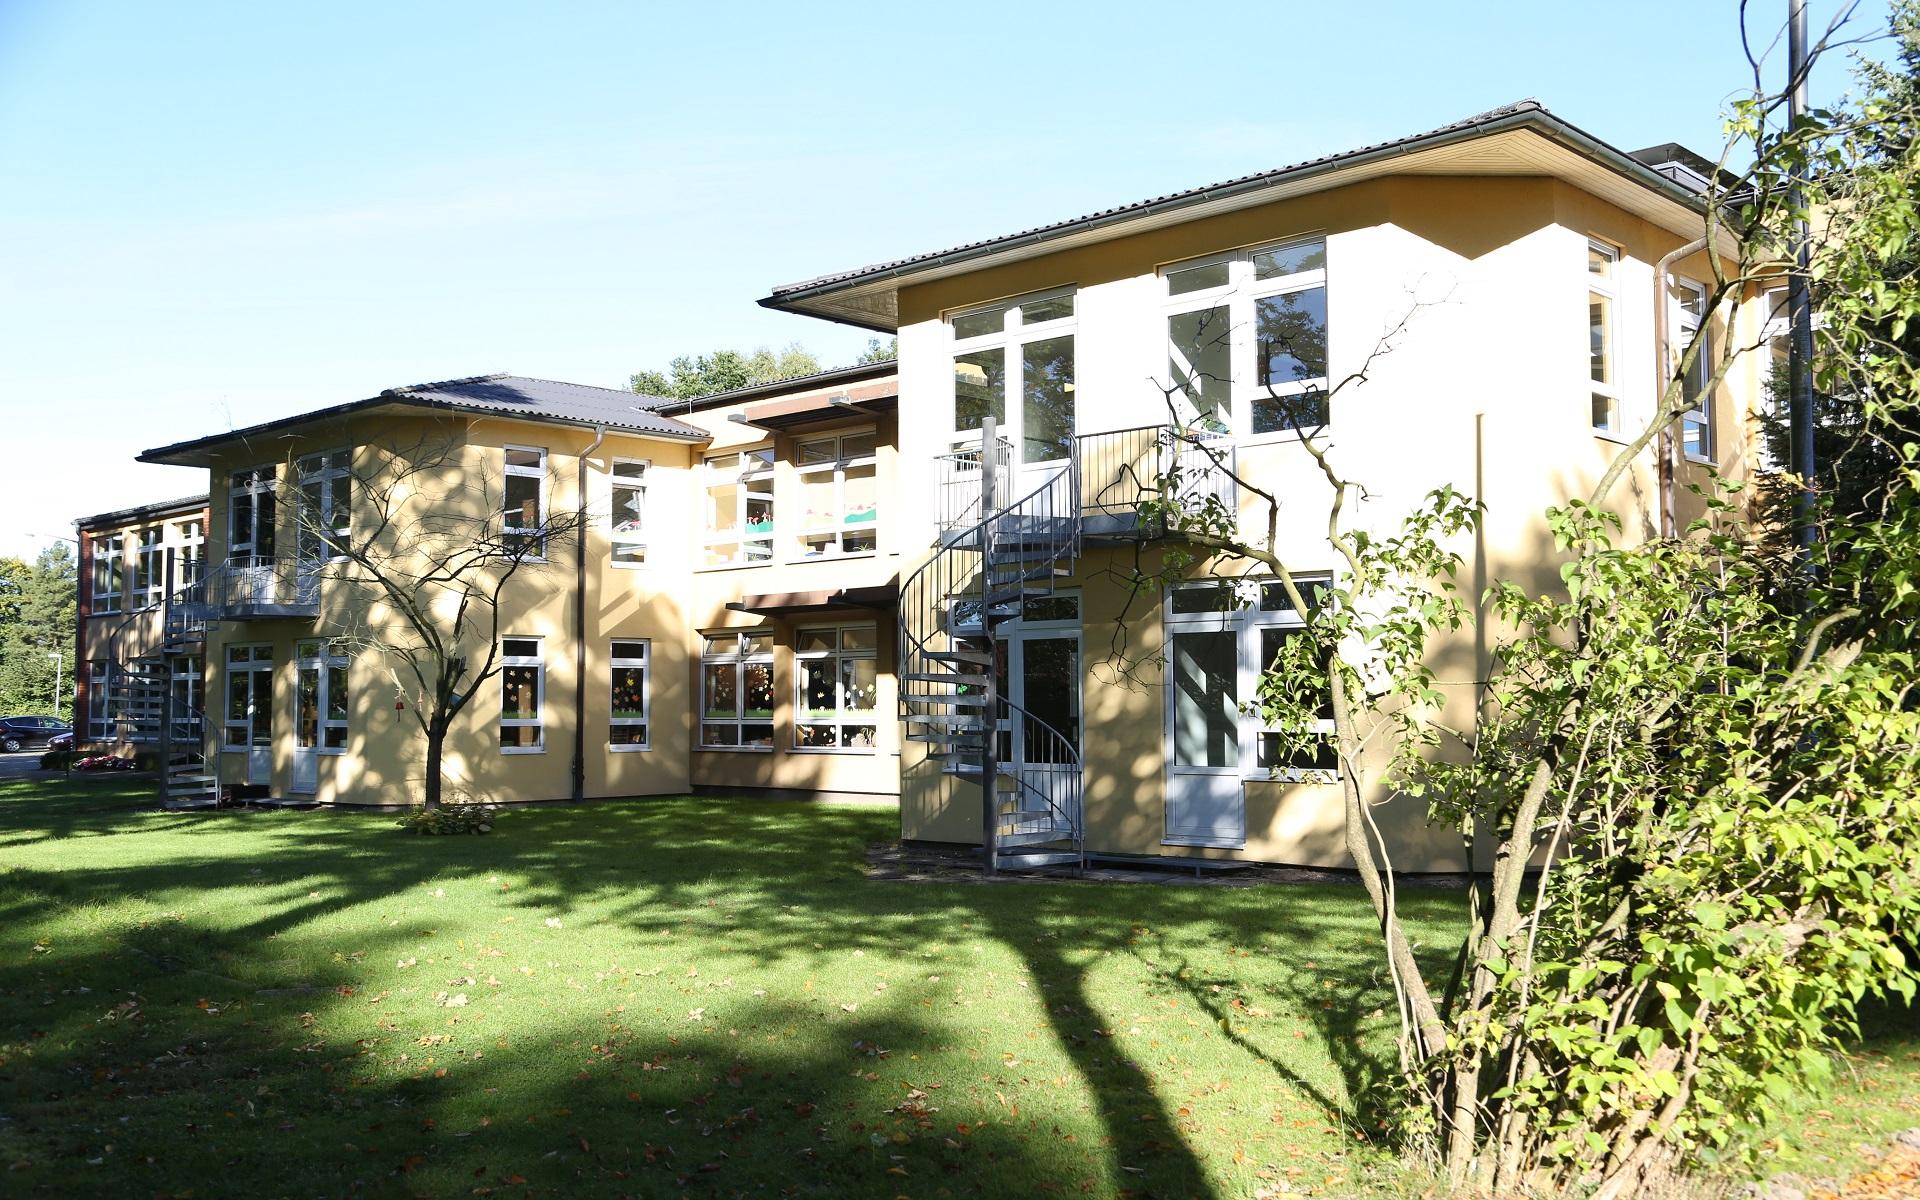 Grundschule Hoisdorf